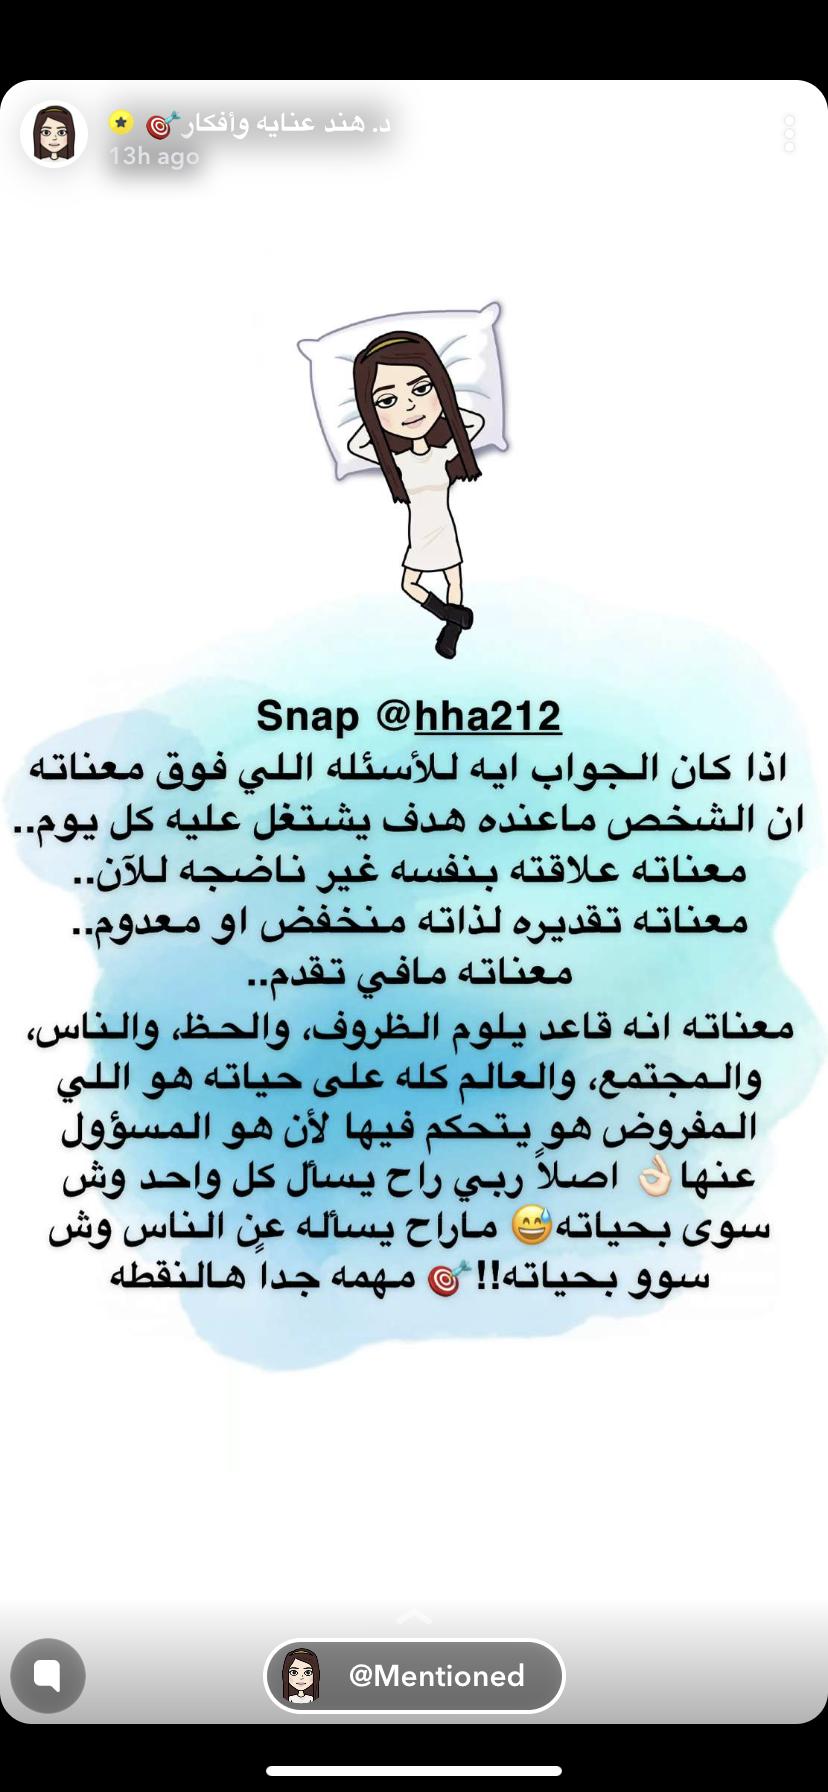 Pin By Sumaya Turkistani On د هند تقدير الذات In 2020 Married Advice Life Advice Memes